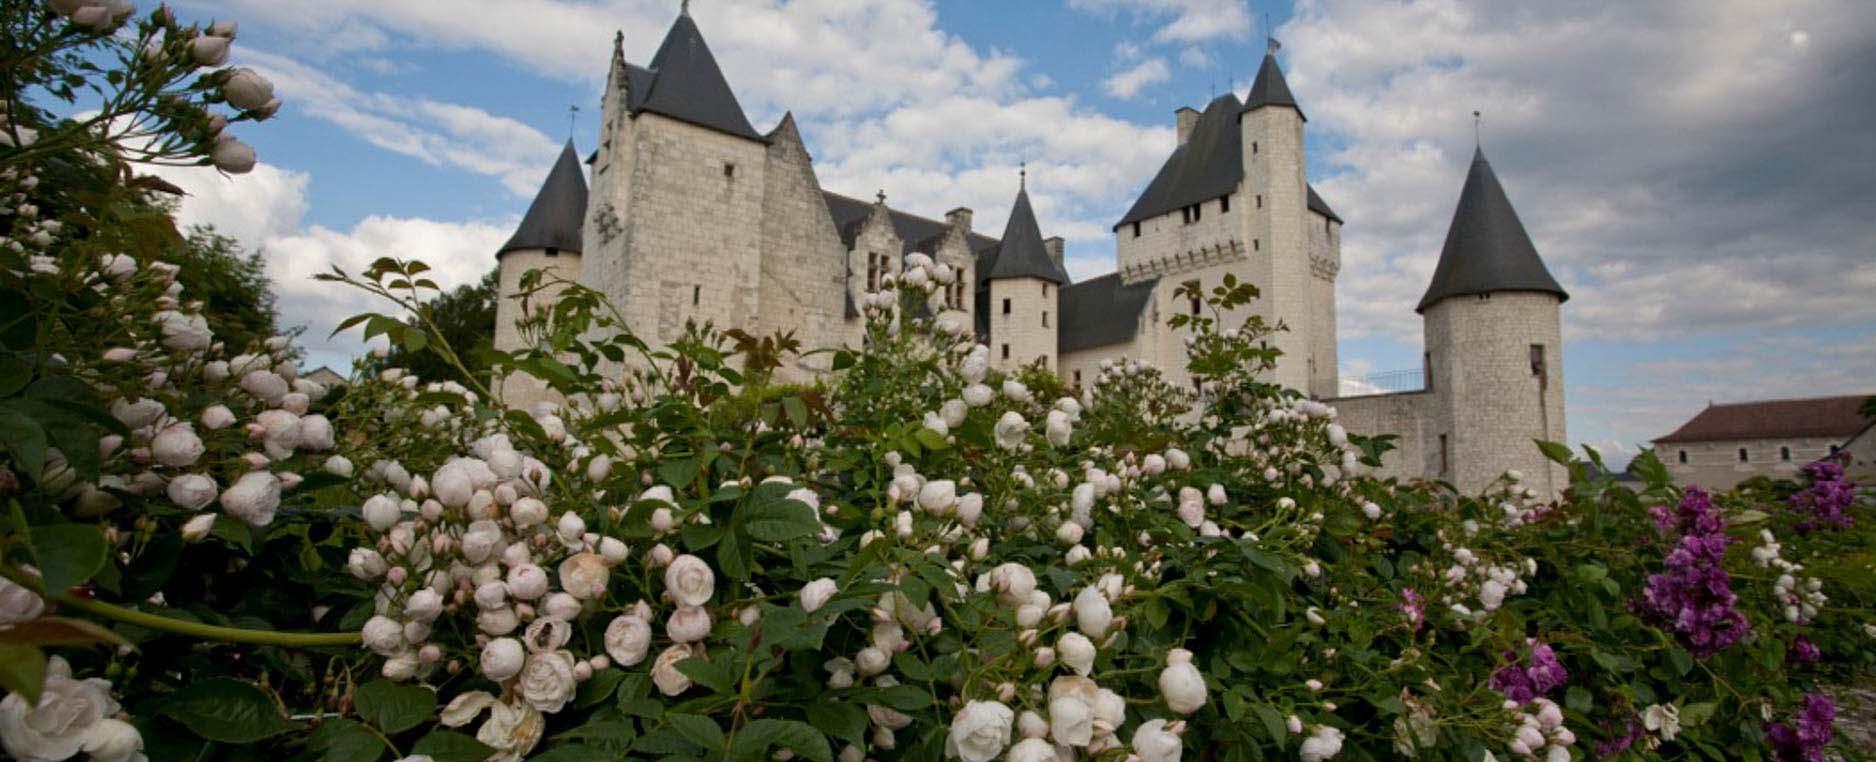 image-chateau-rivau-02.jpg